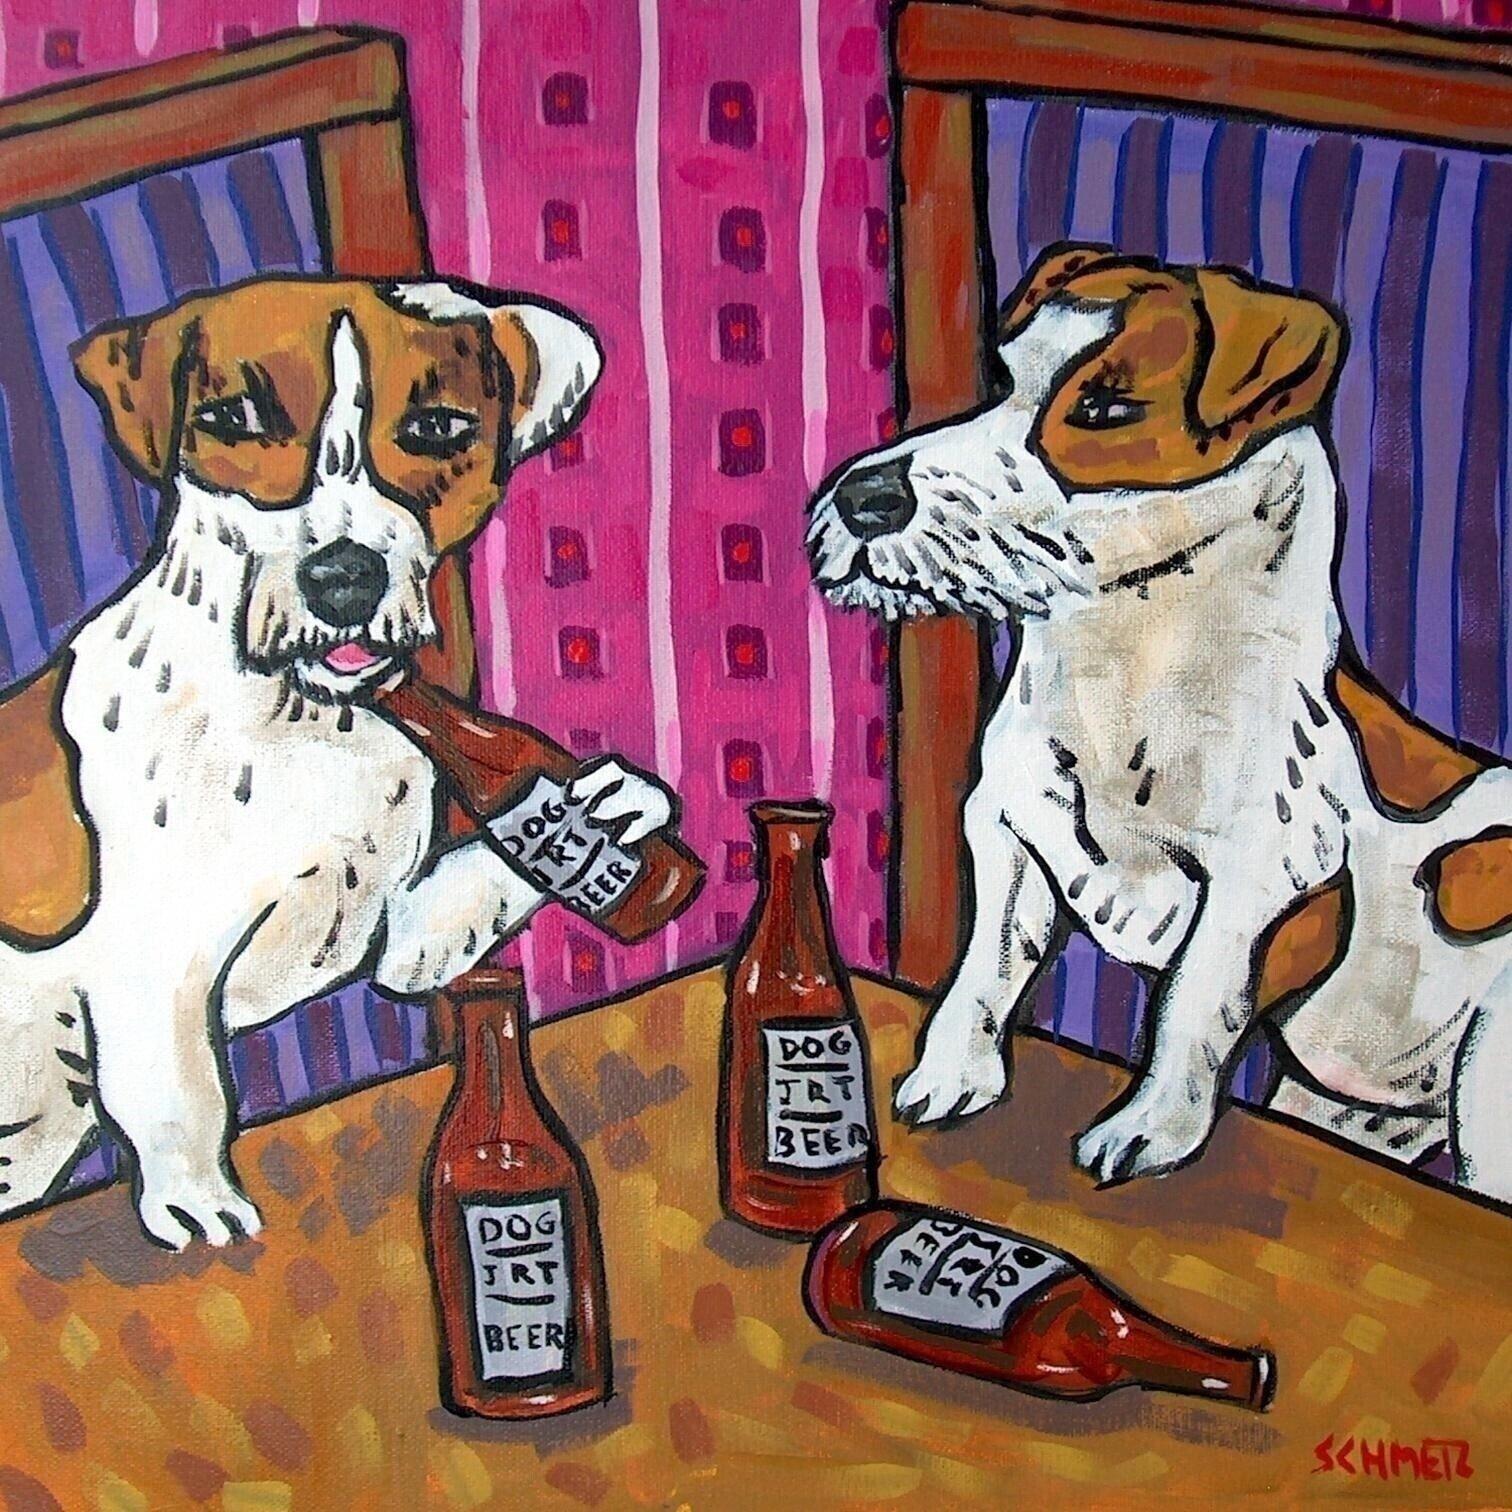 jack russelLs AT THE BAR BEER 4.25 sq dog art tile